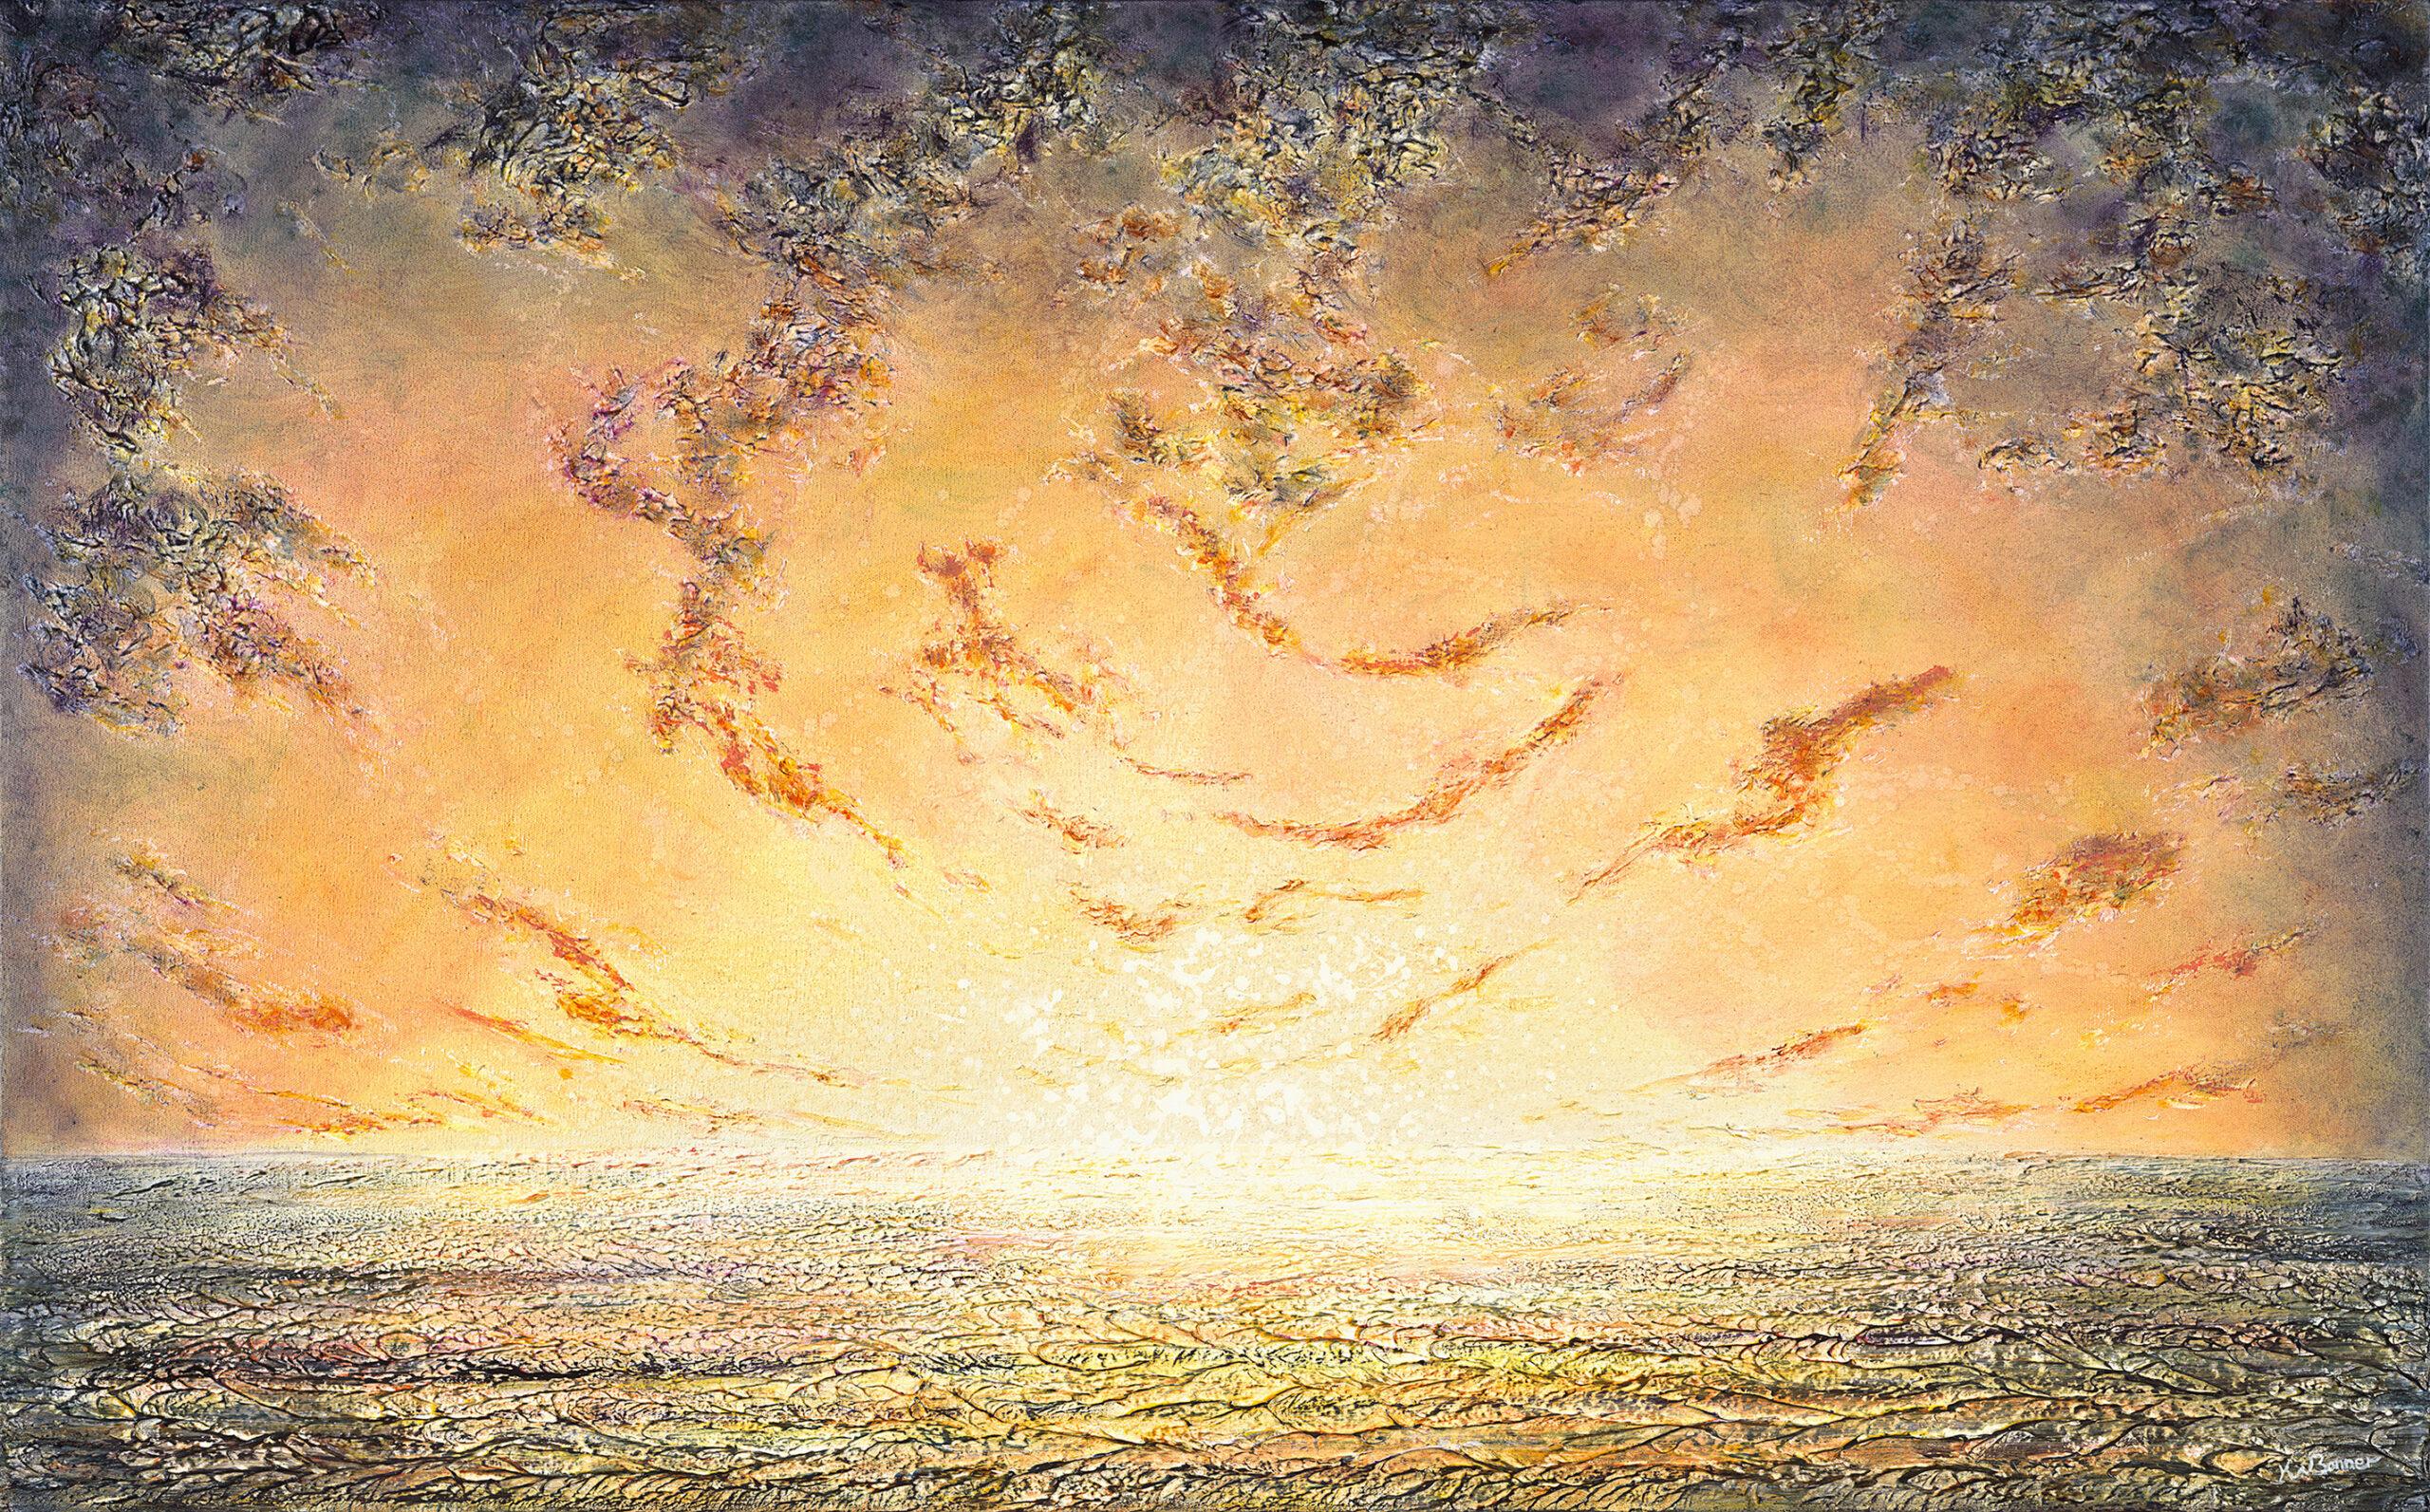 Love Love Me Do | Seascapes | Ken Bonner Original Oil Paintings | Santa Fe New Mexico